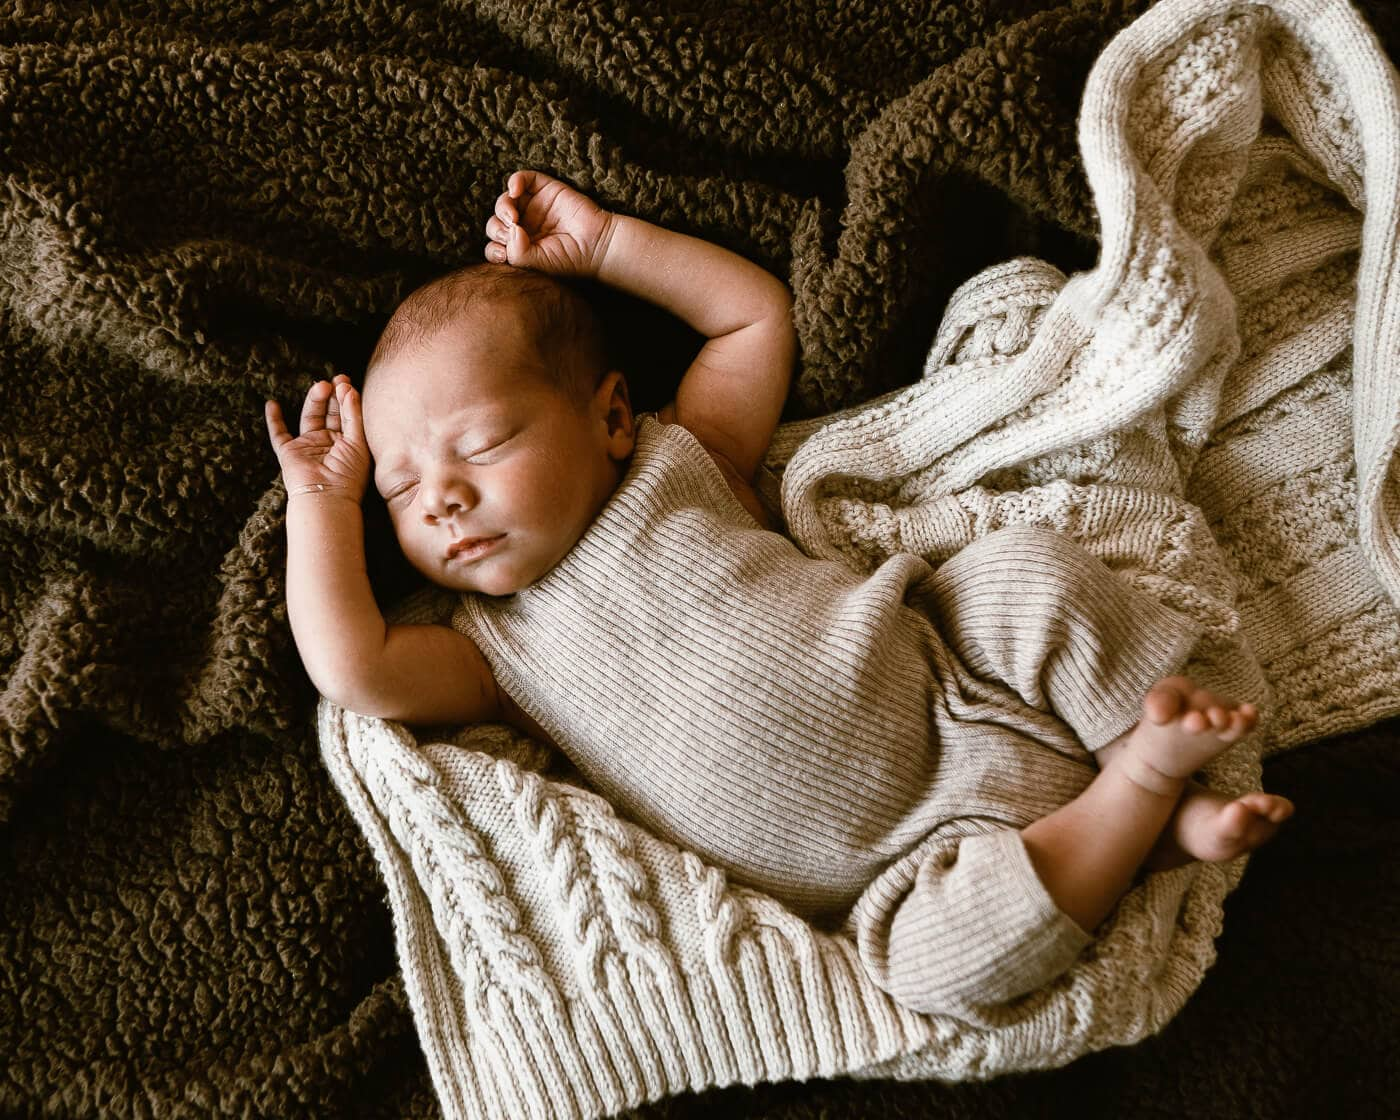 Newborn baby wearing beige onepice jumpsuit on knit blanket on bed